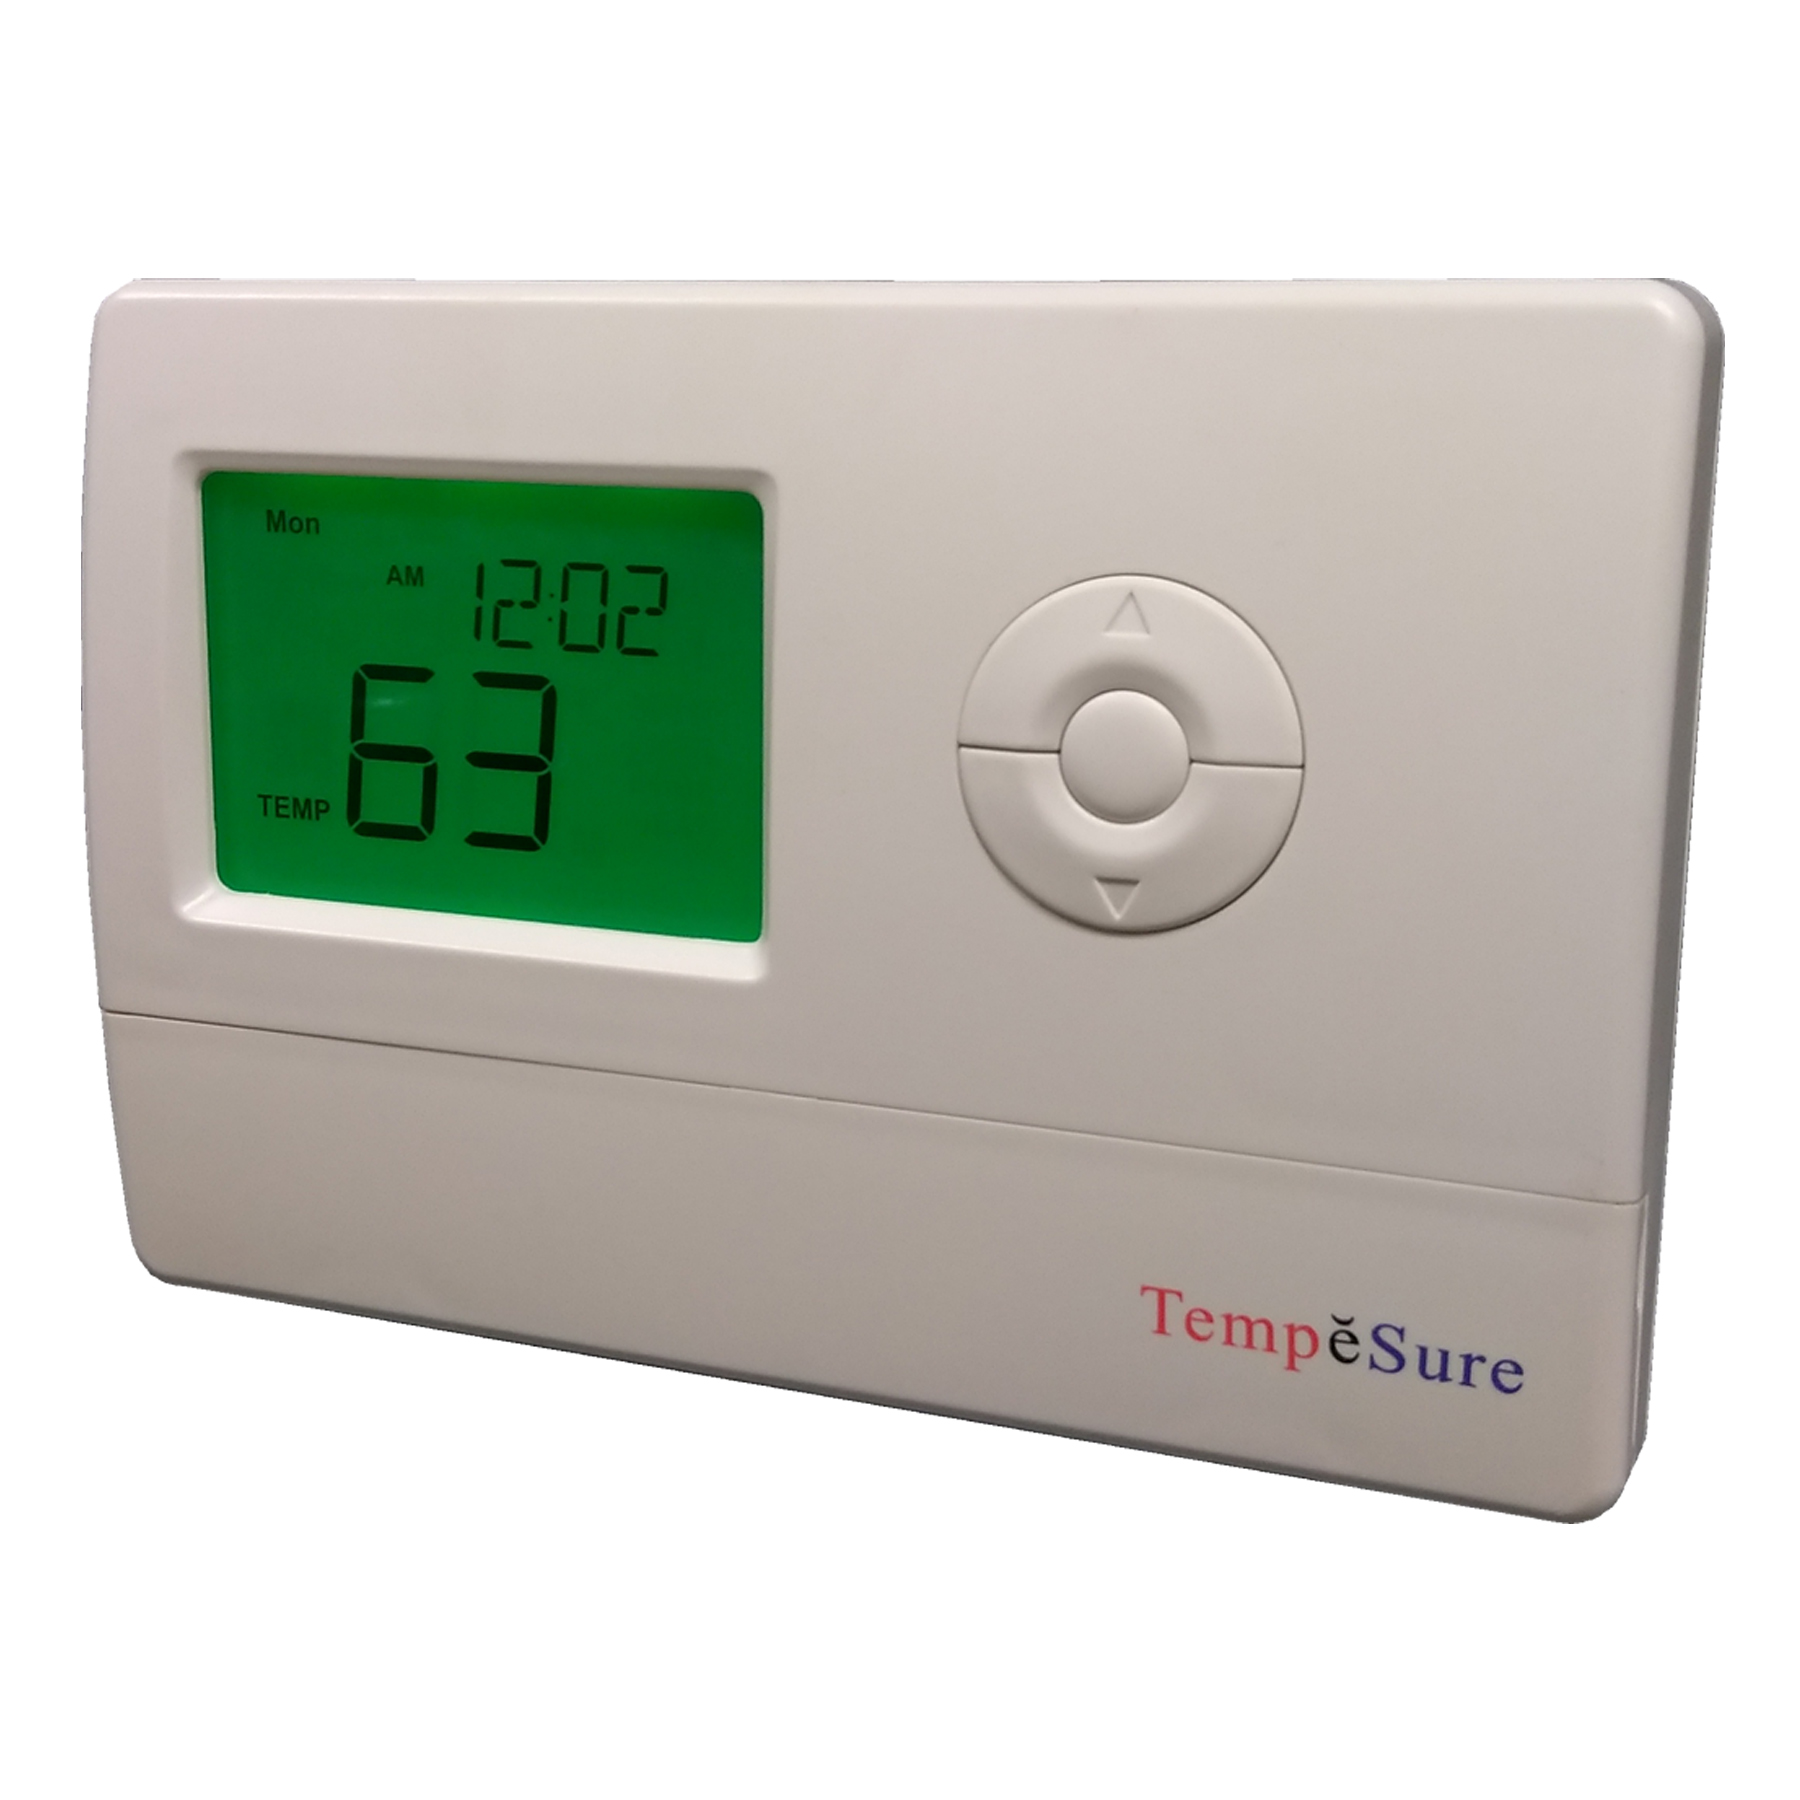 heat thermostat gas 2005 gmc sierra wiring diagram tempesure tespr22 digital programmable with